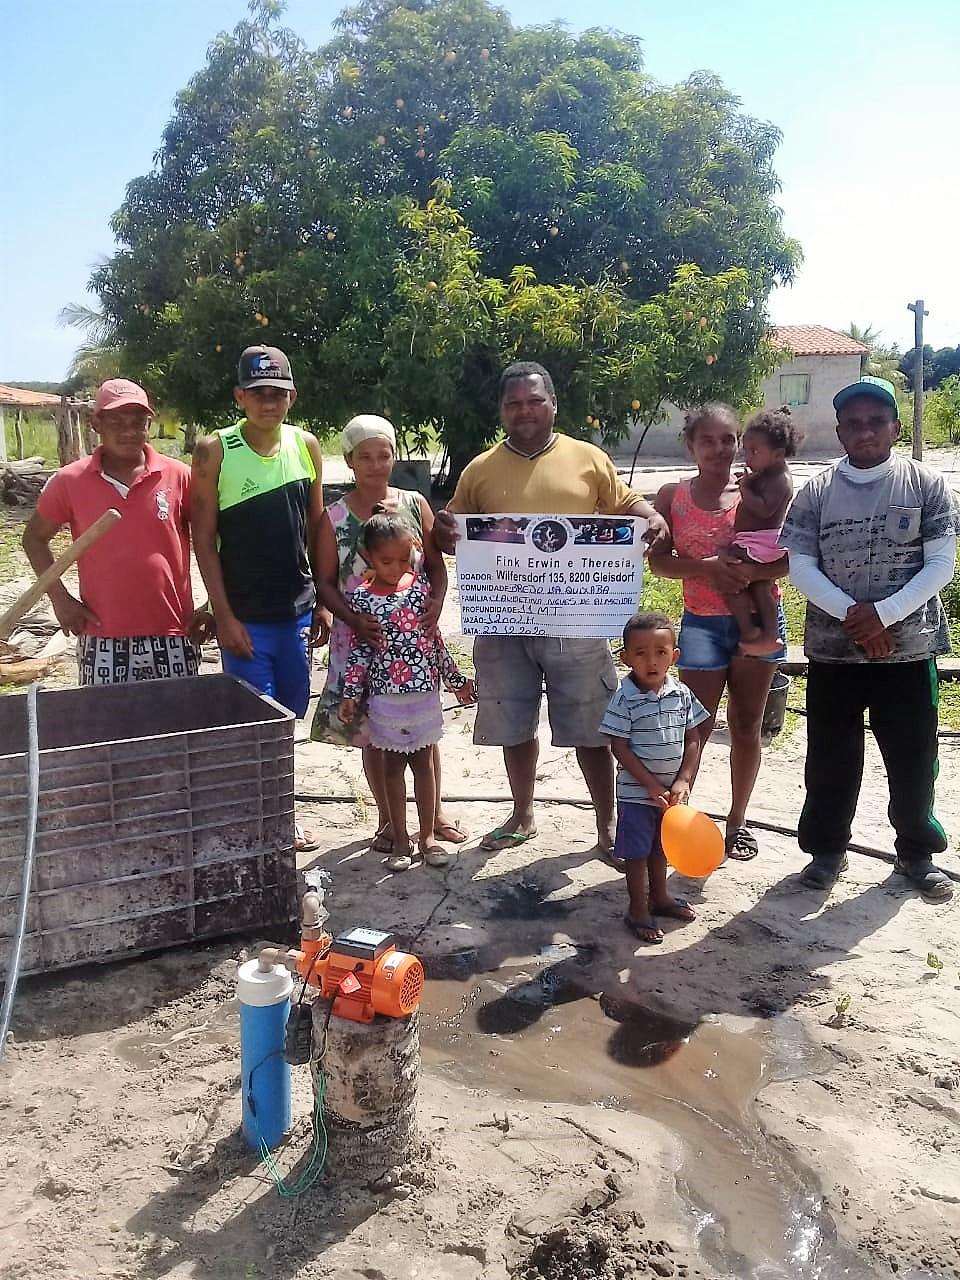 2020-12-22 Bahia - Image 2